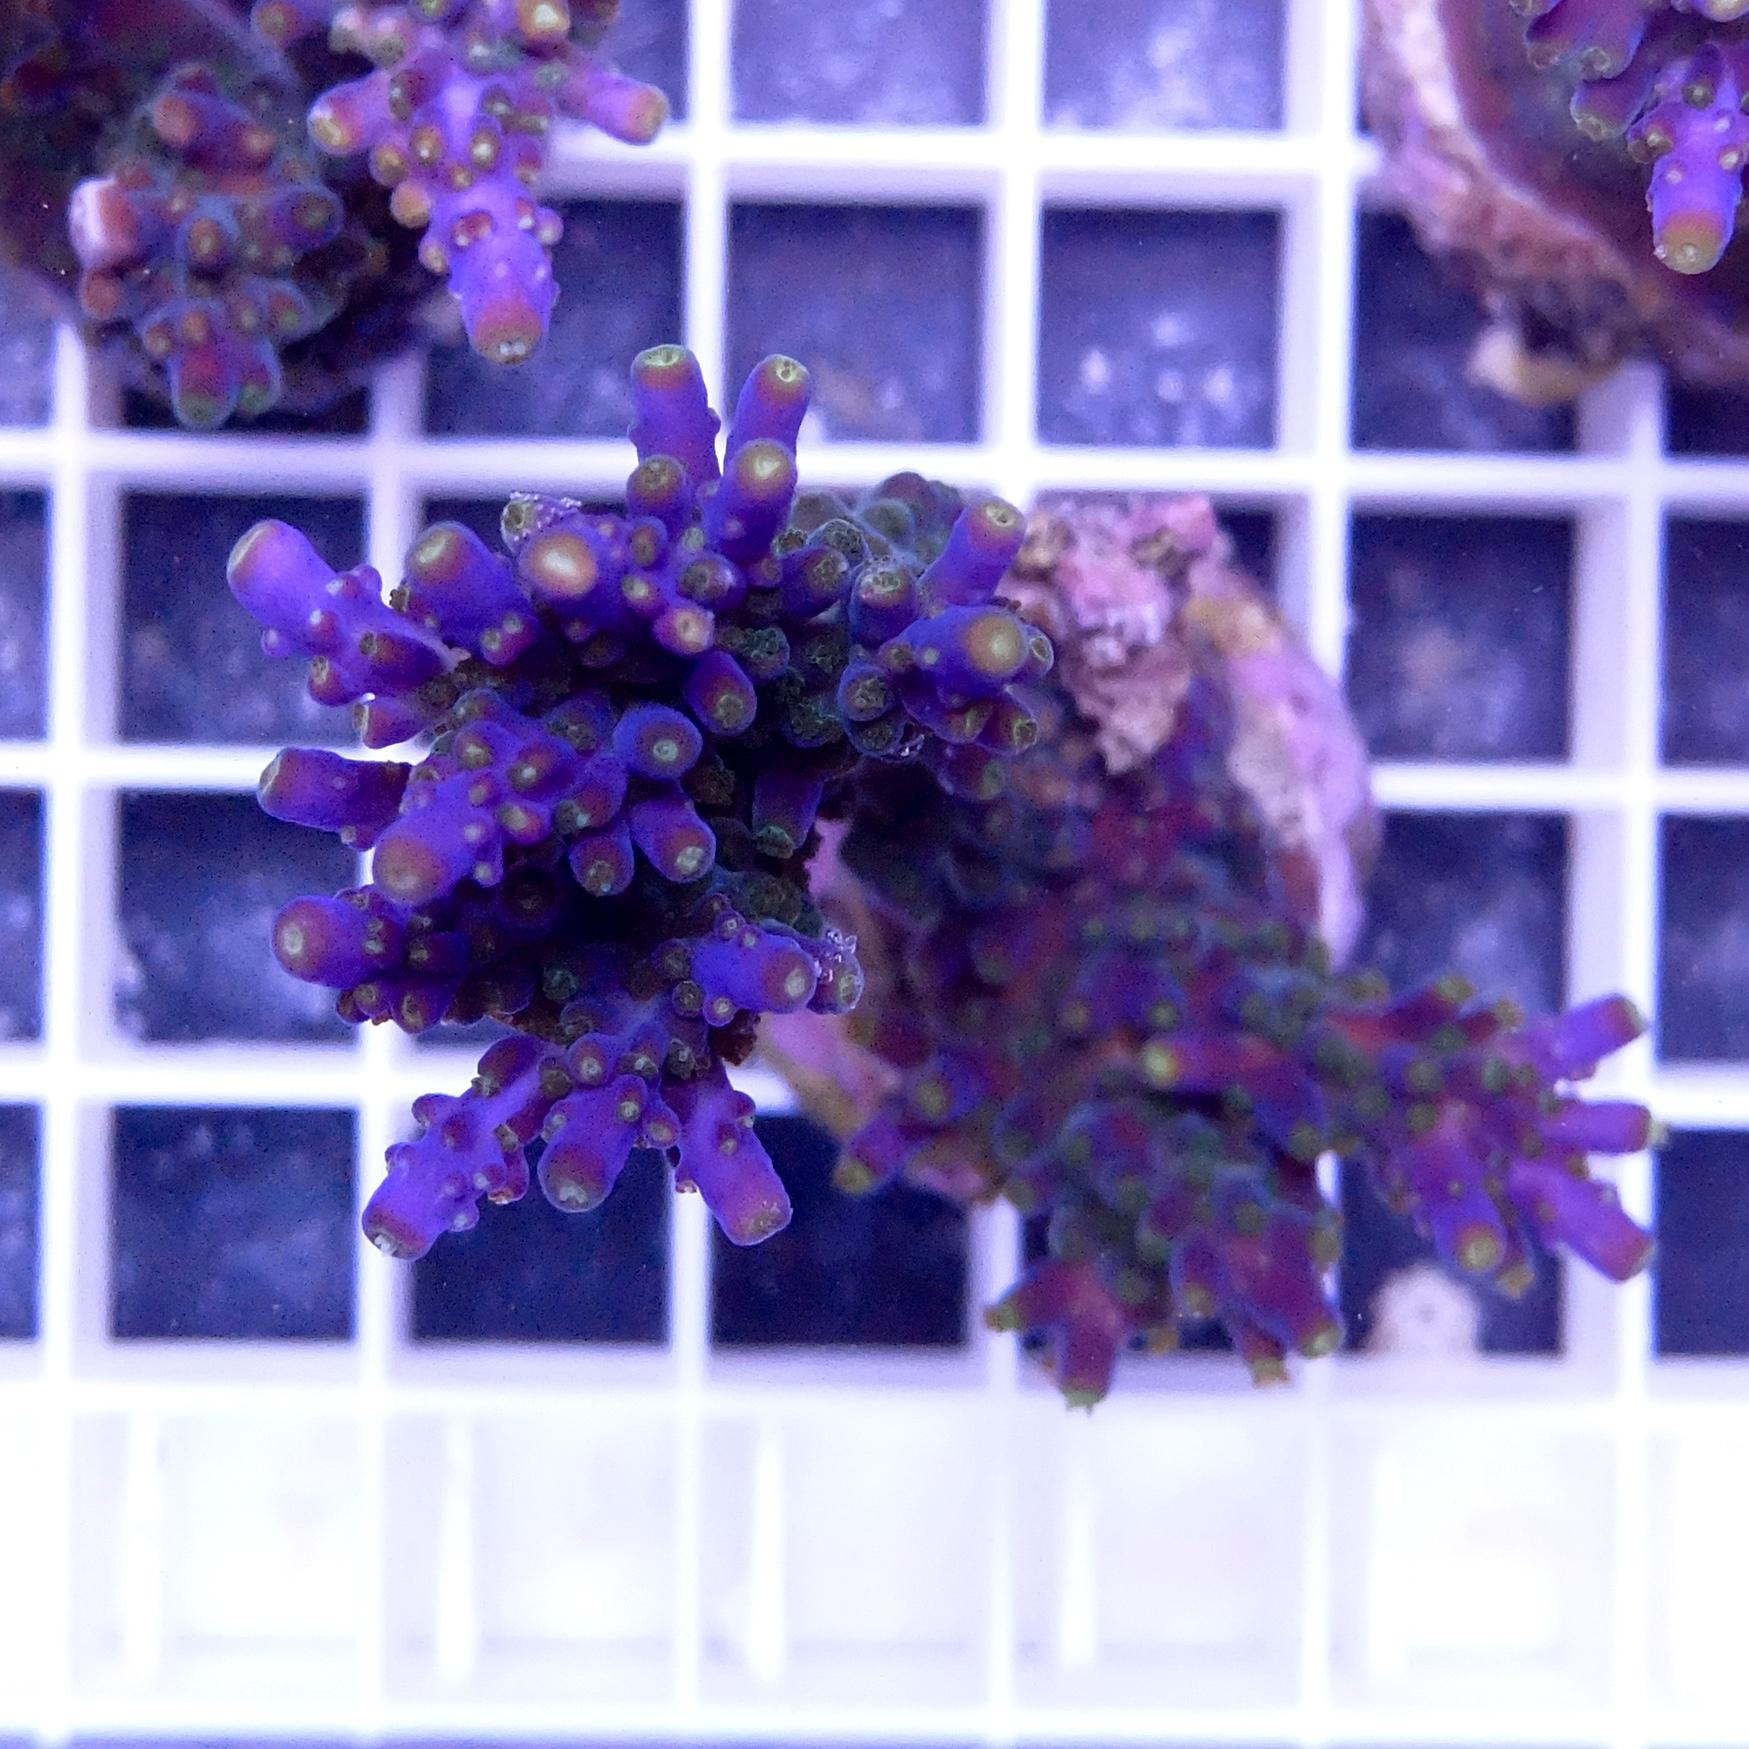 Acropora valida meerwasser aquaristik potsdam for Meerwasser aquaristik shop